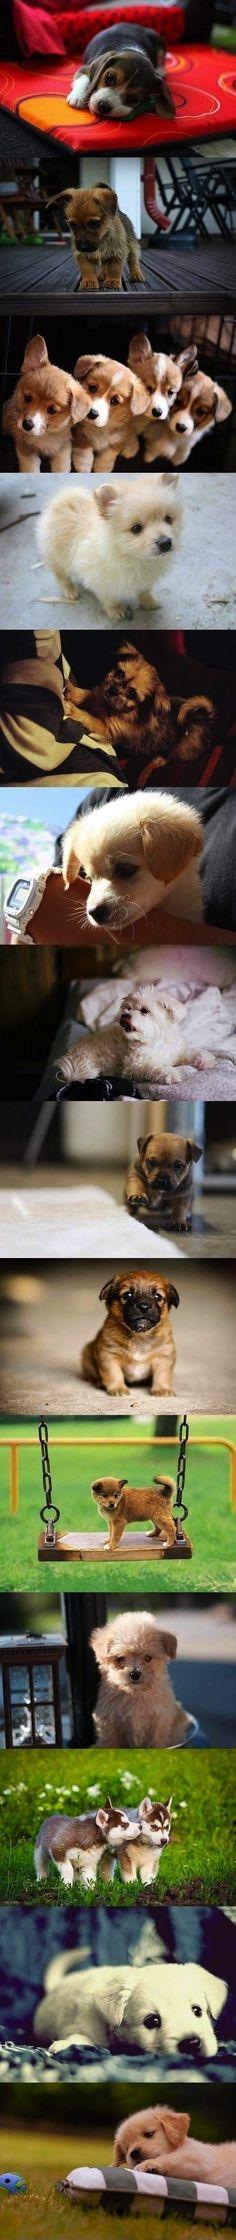 Adorable puppies!!